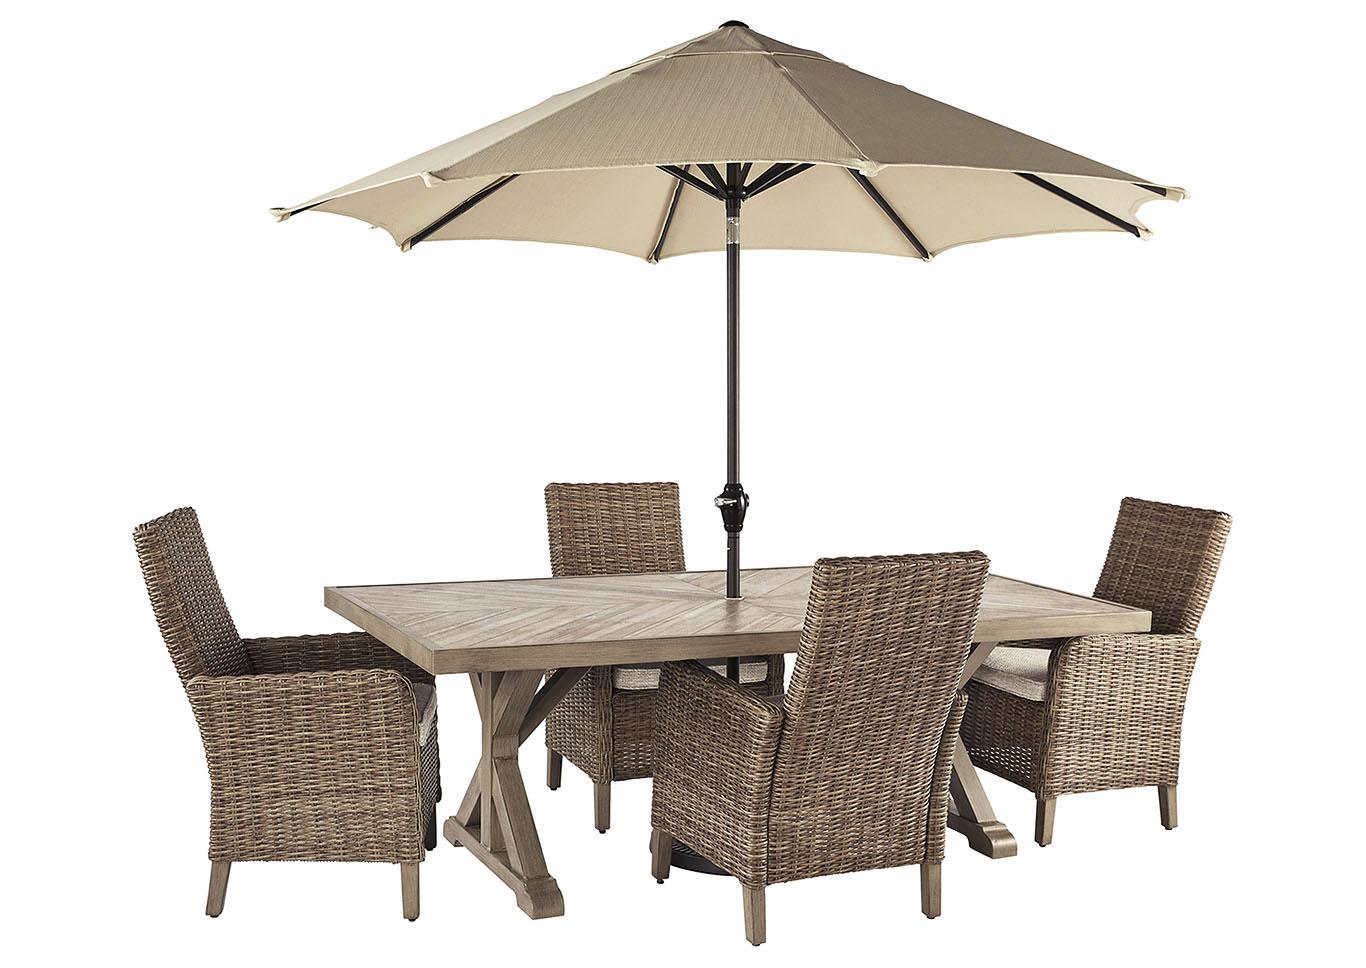 Cool Furniture Mart Usa Discount Ashley Furniture Store Download Free Architecture Designs Crovemadebymaigaardcom